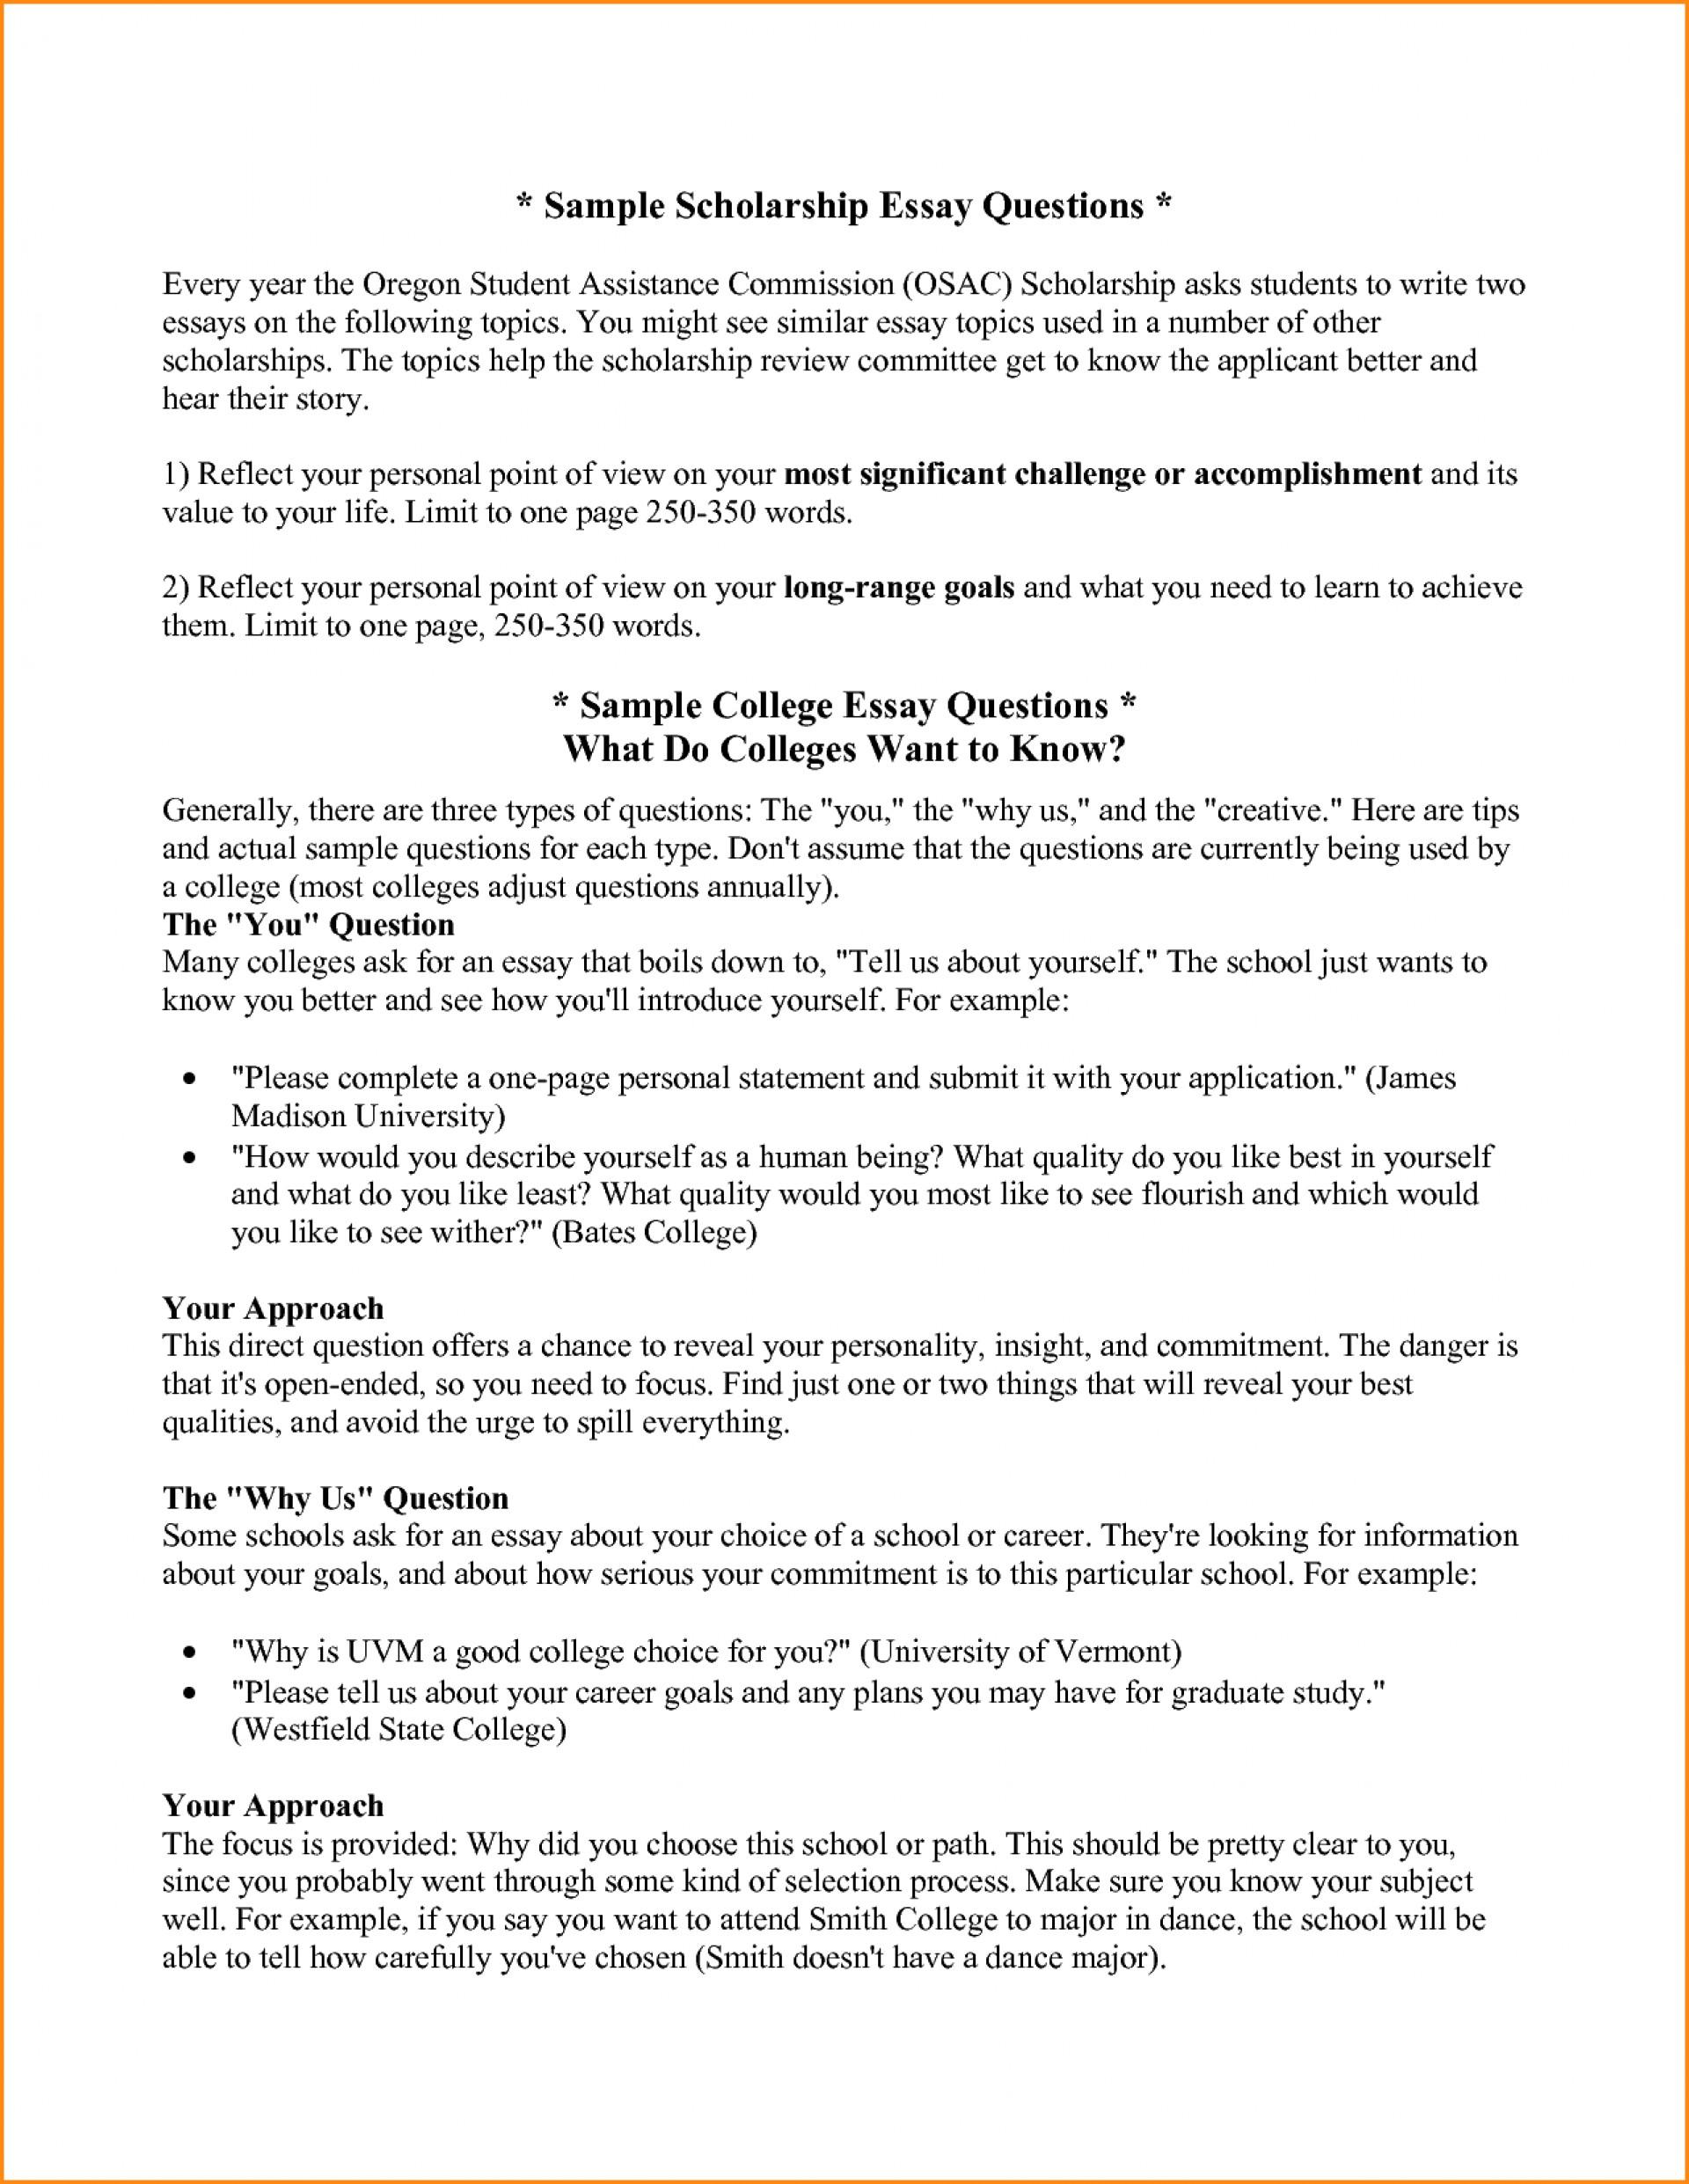 001 Essay Example Scholarship Prompts College Fix Ablez Topics List Magnificent Robertson 2018-19 Vanderbilt Washington And Lee Johnson 1920